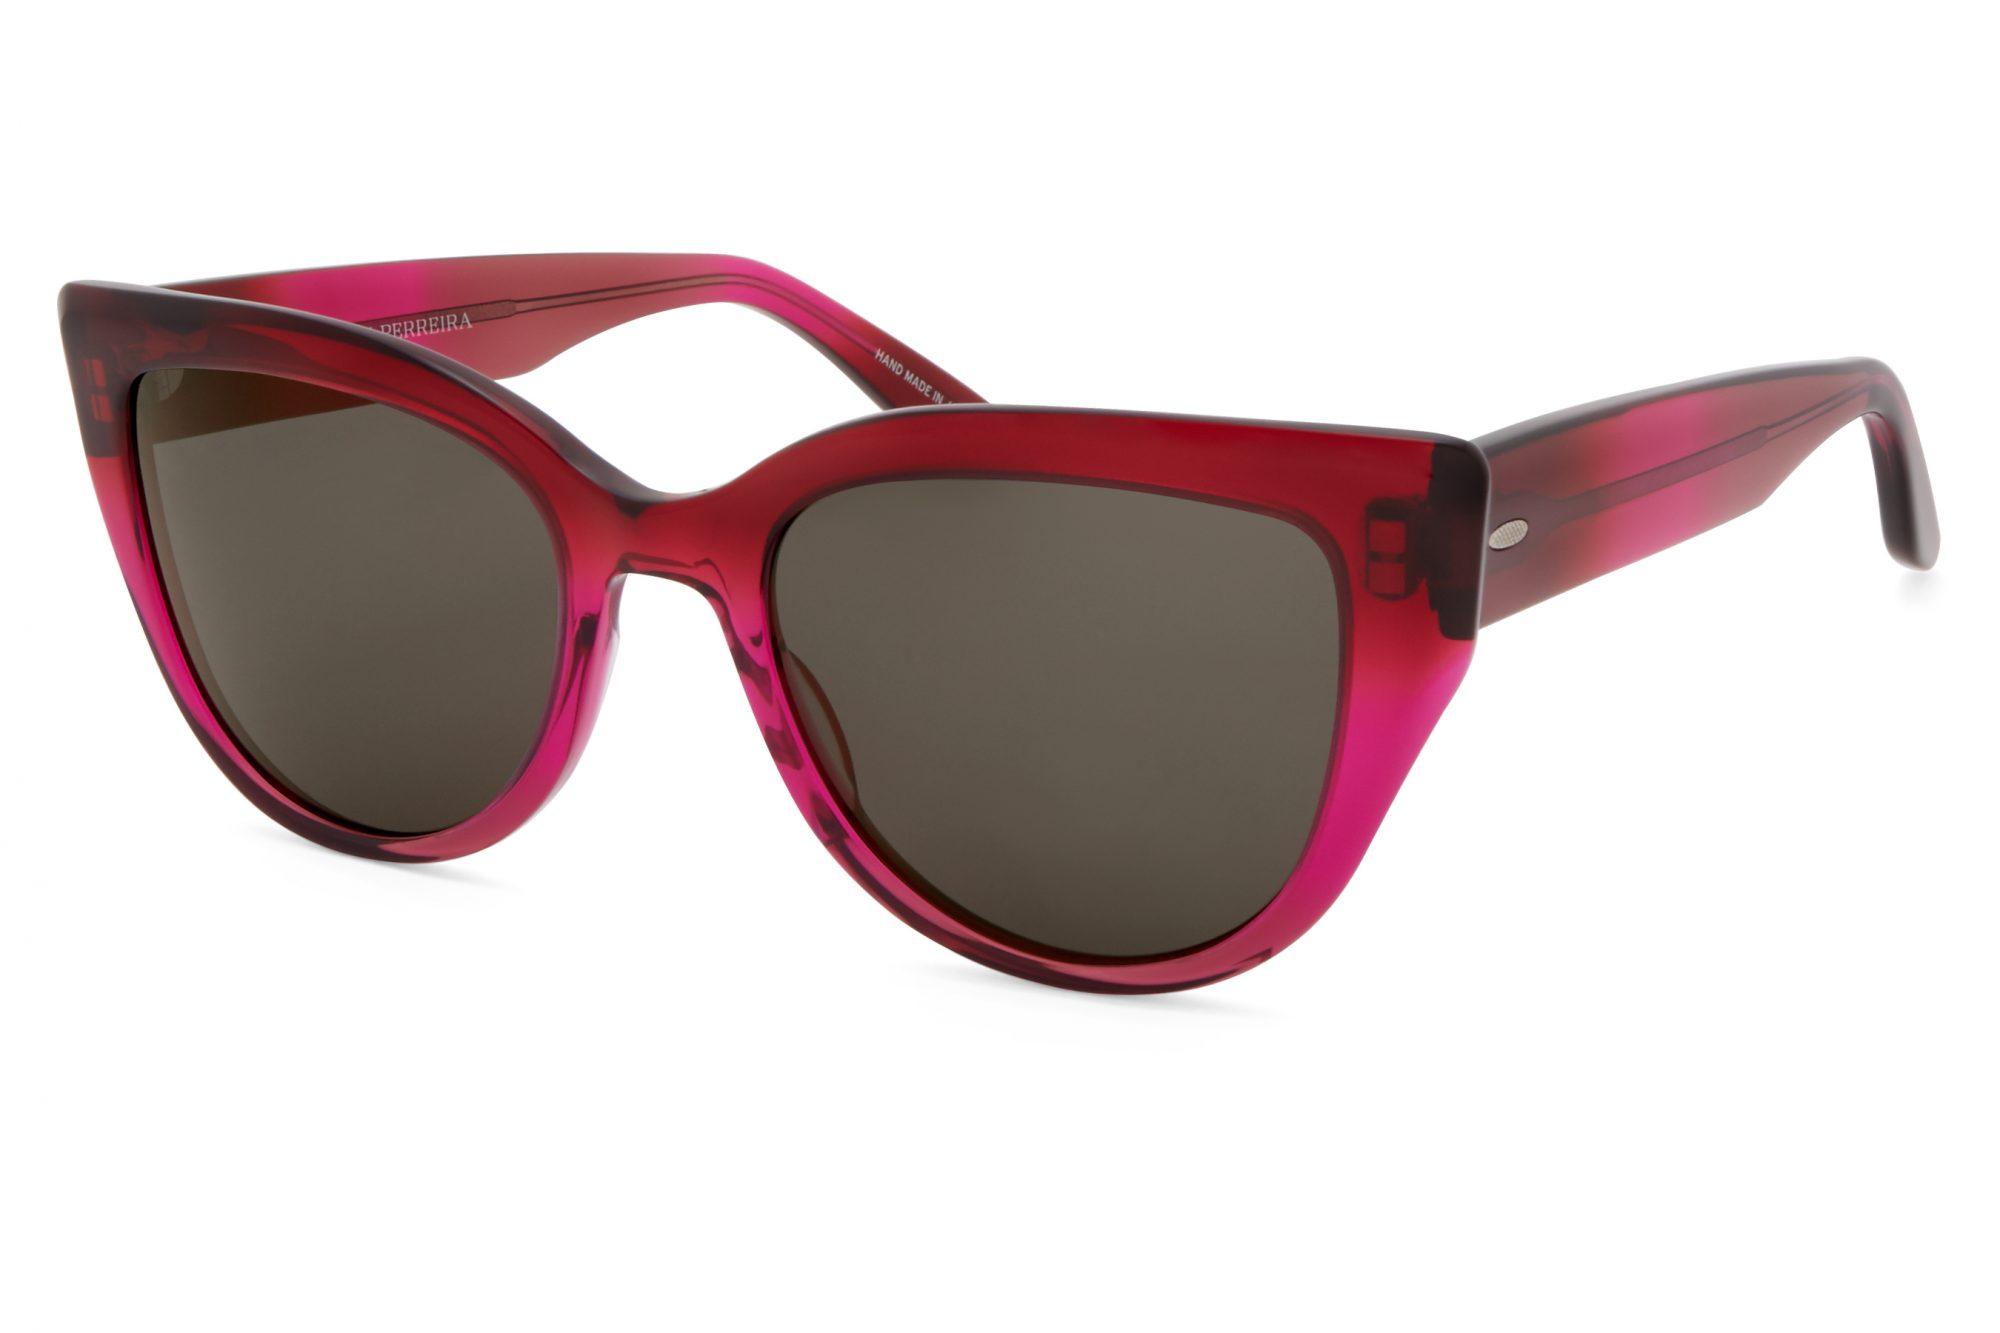 Barton Perreira cat-eye sunglasses